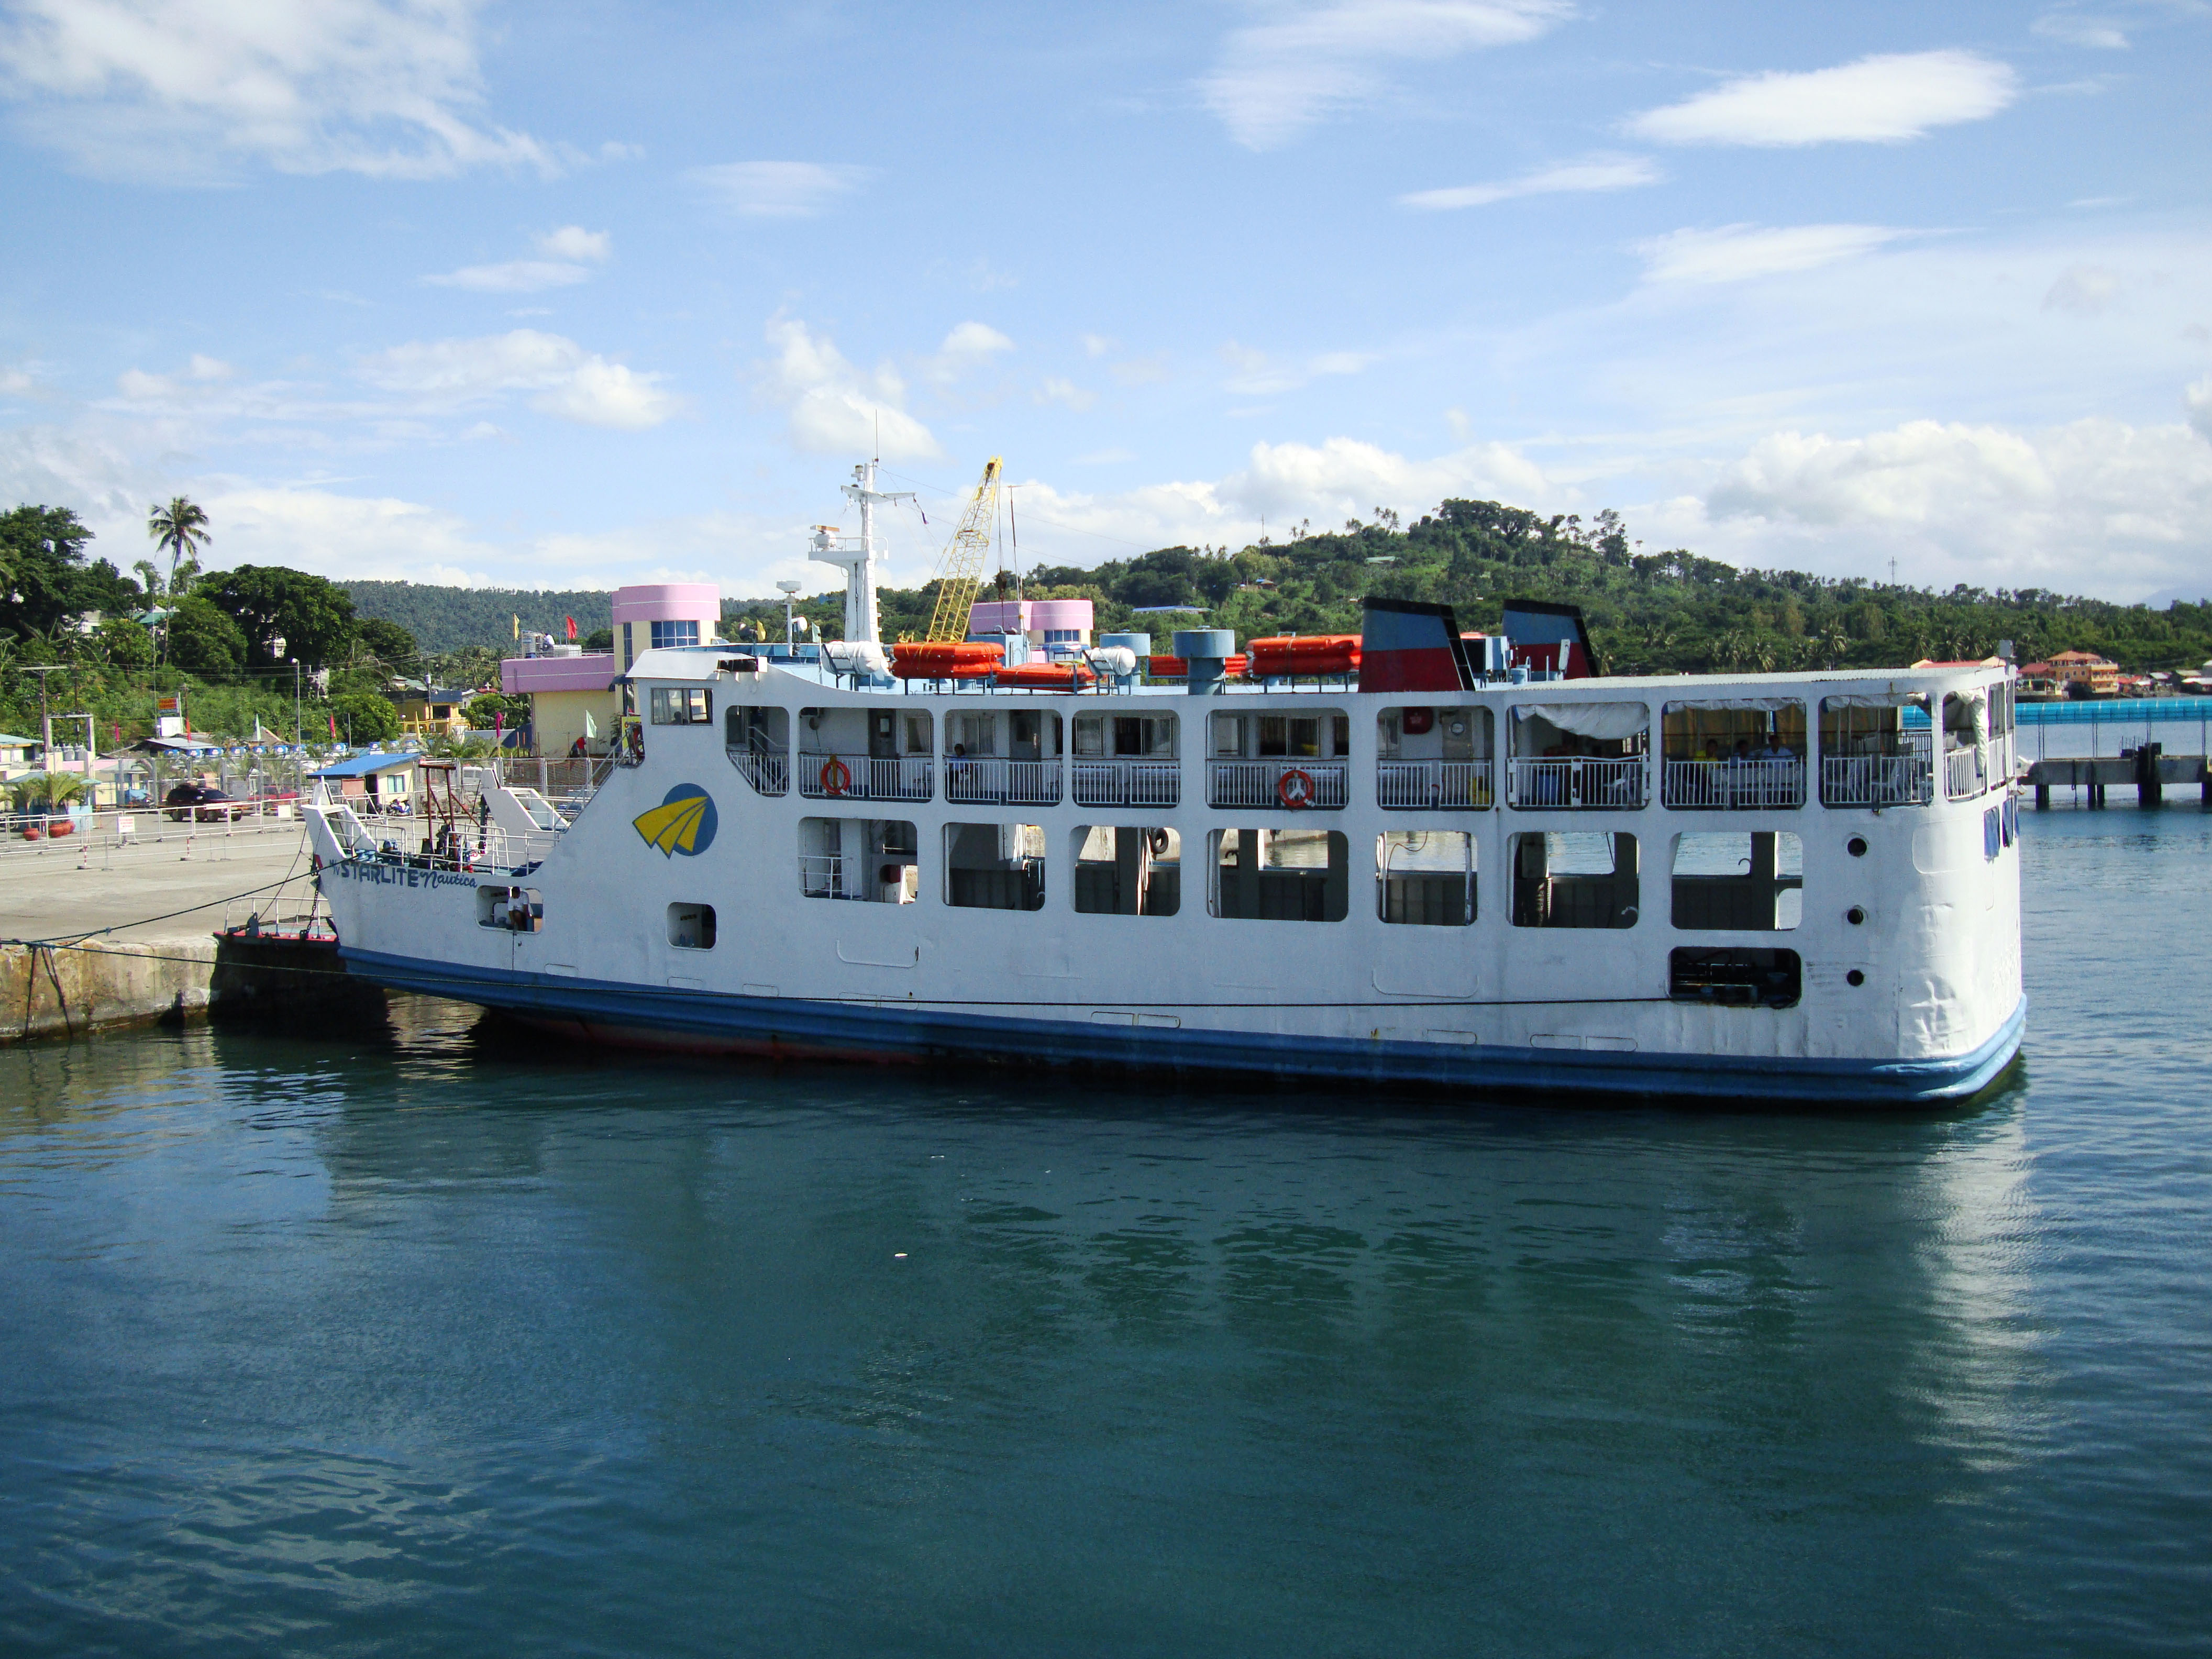 MV Starlite Nautica Calapan Pier Philippines 01